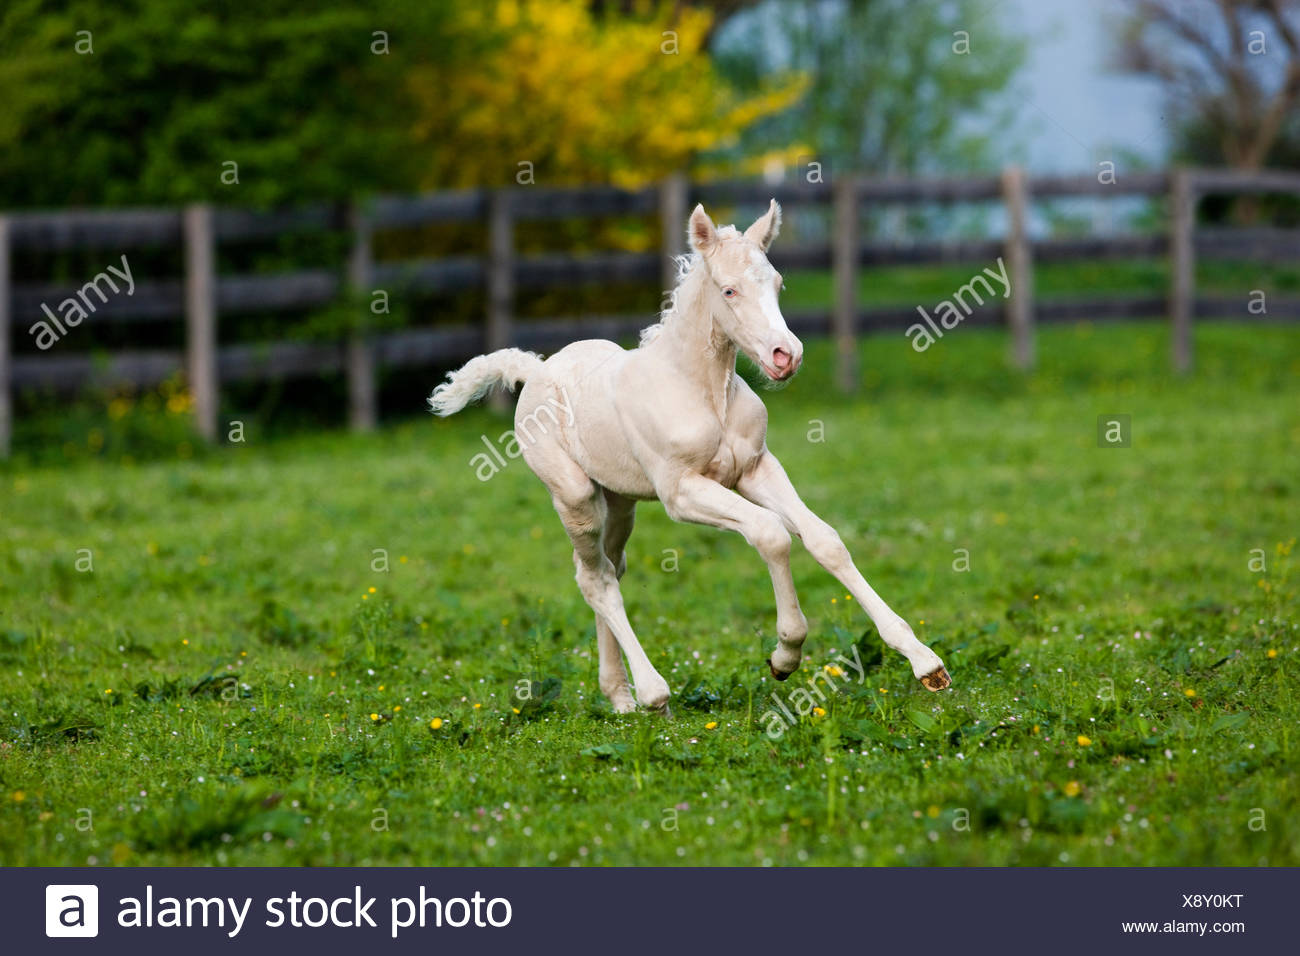 cremello-morgan-horse-foal-galloping-in-